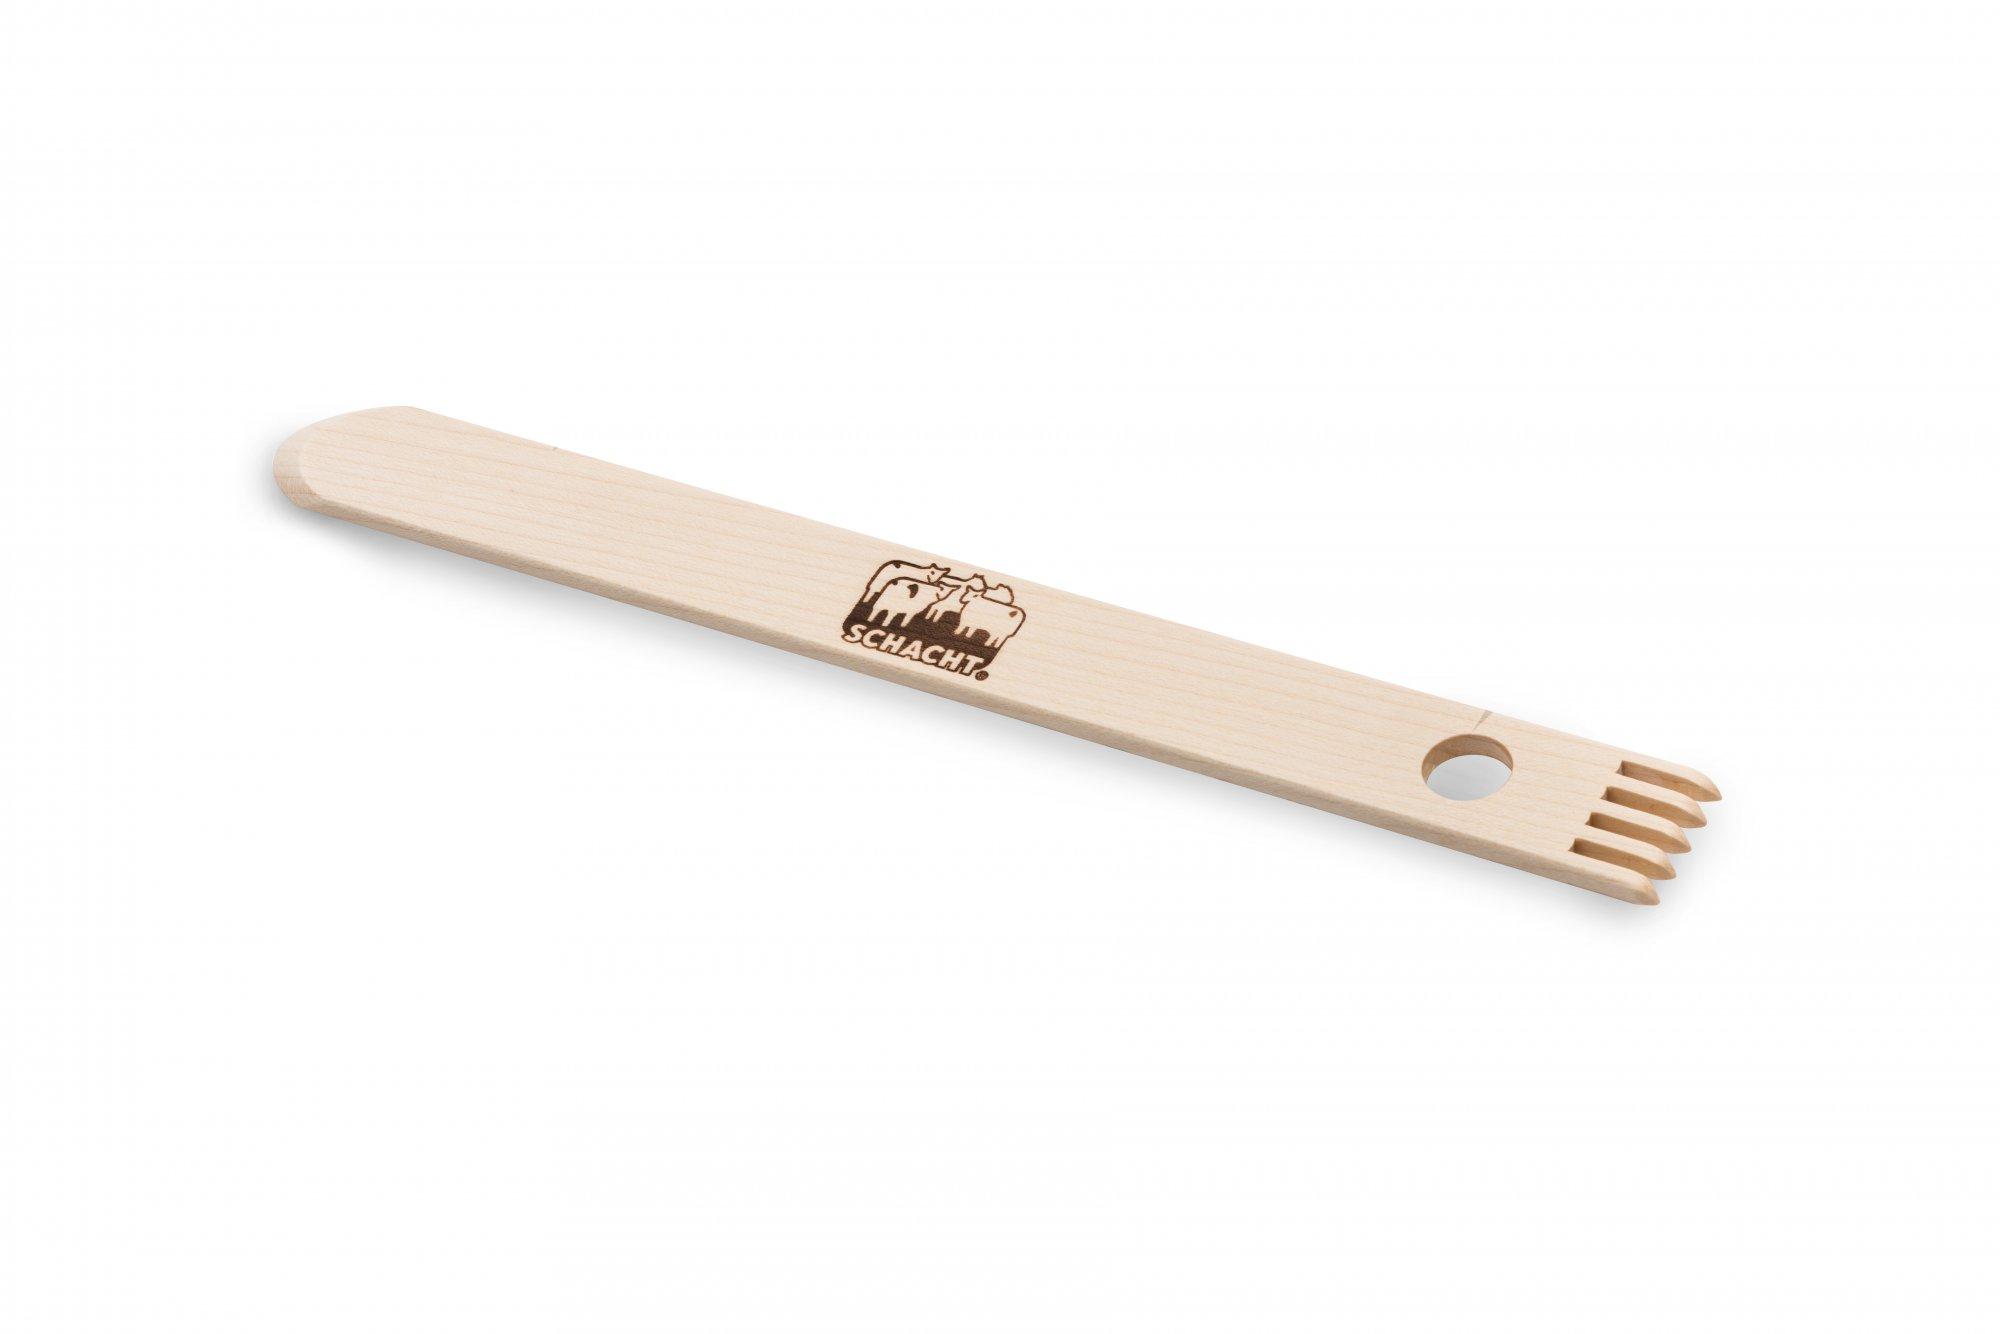 schacht 3-in-1 magic stick